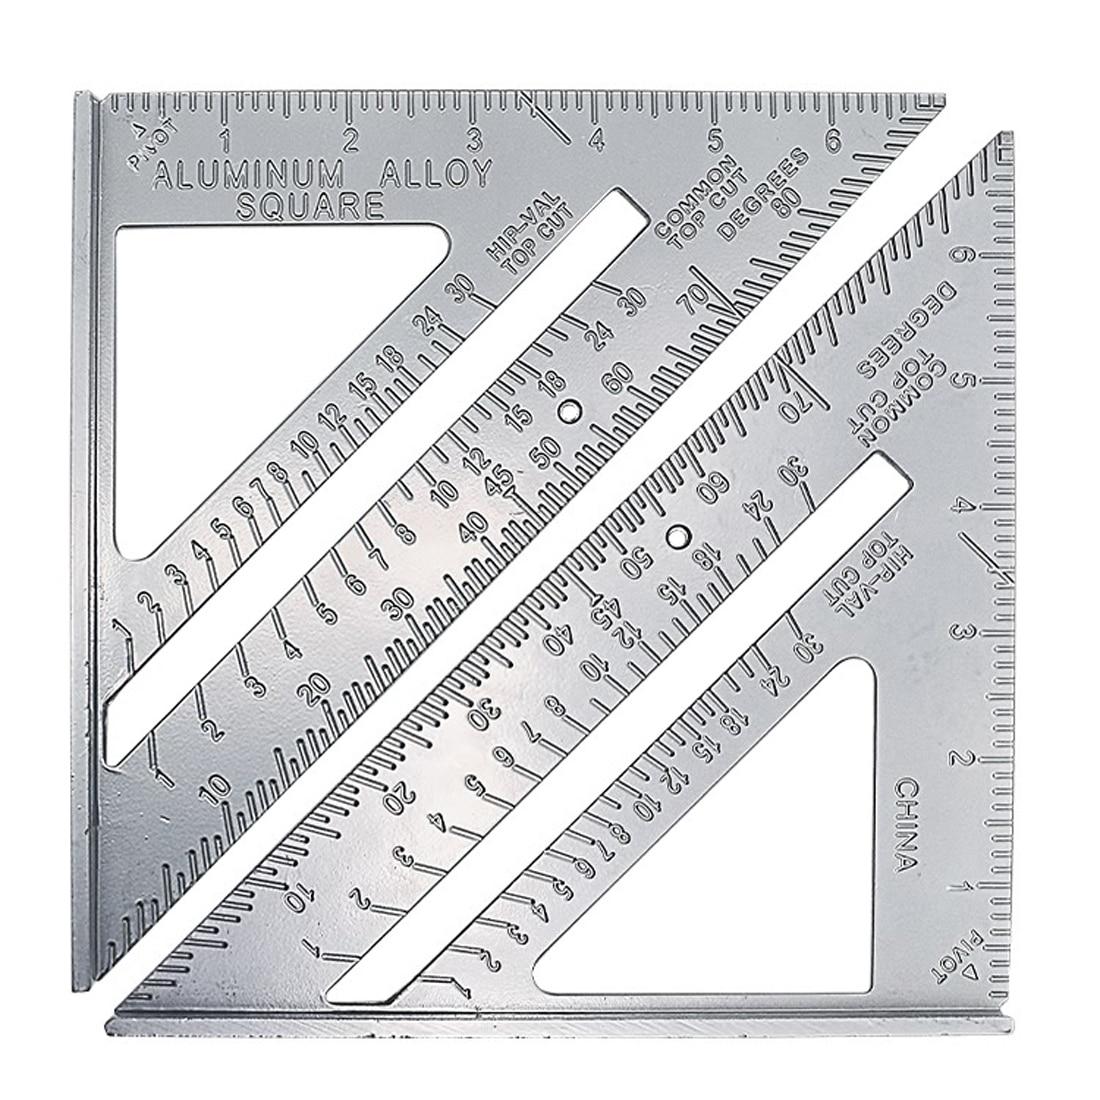 square in a square ruler tutorial